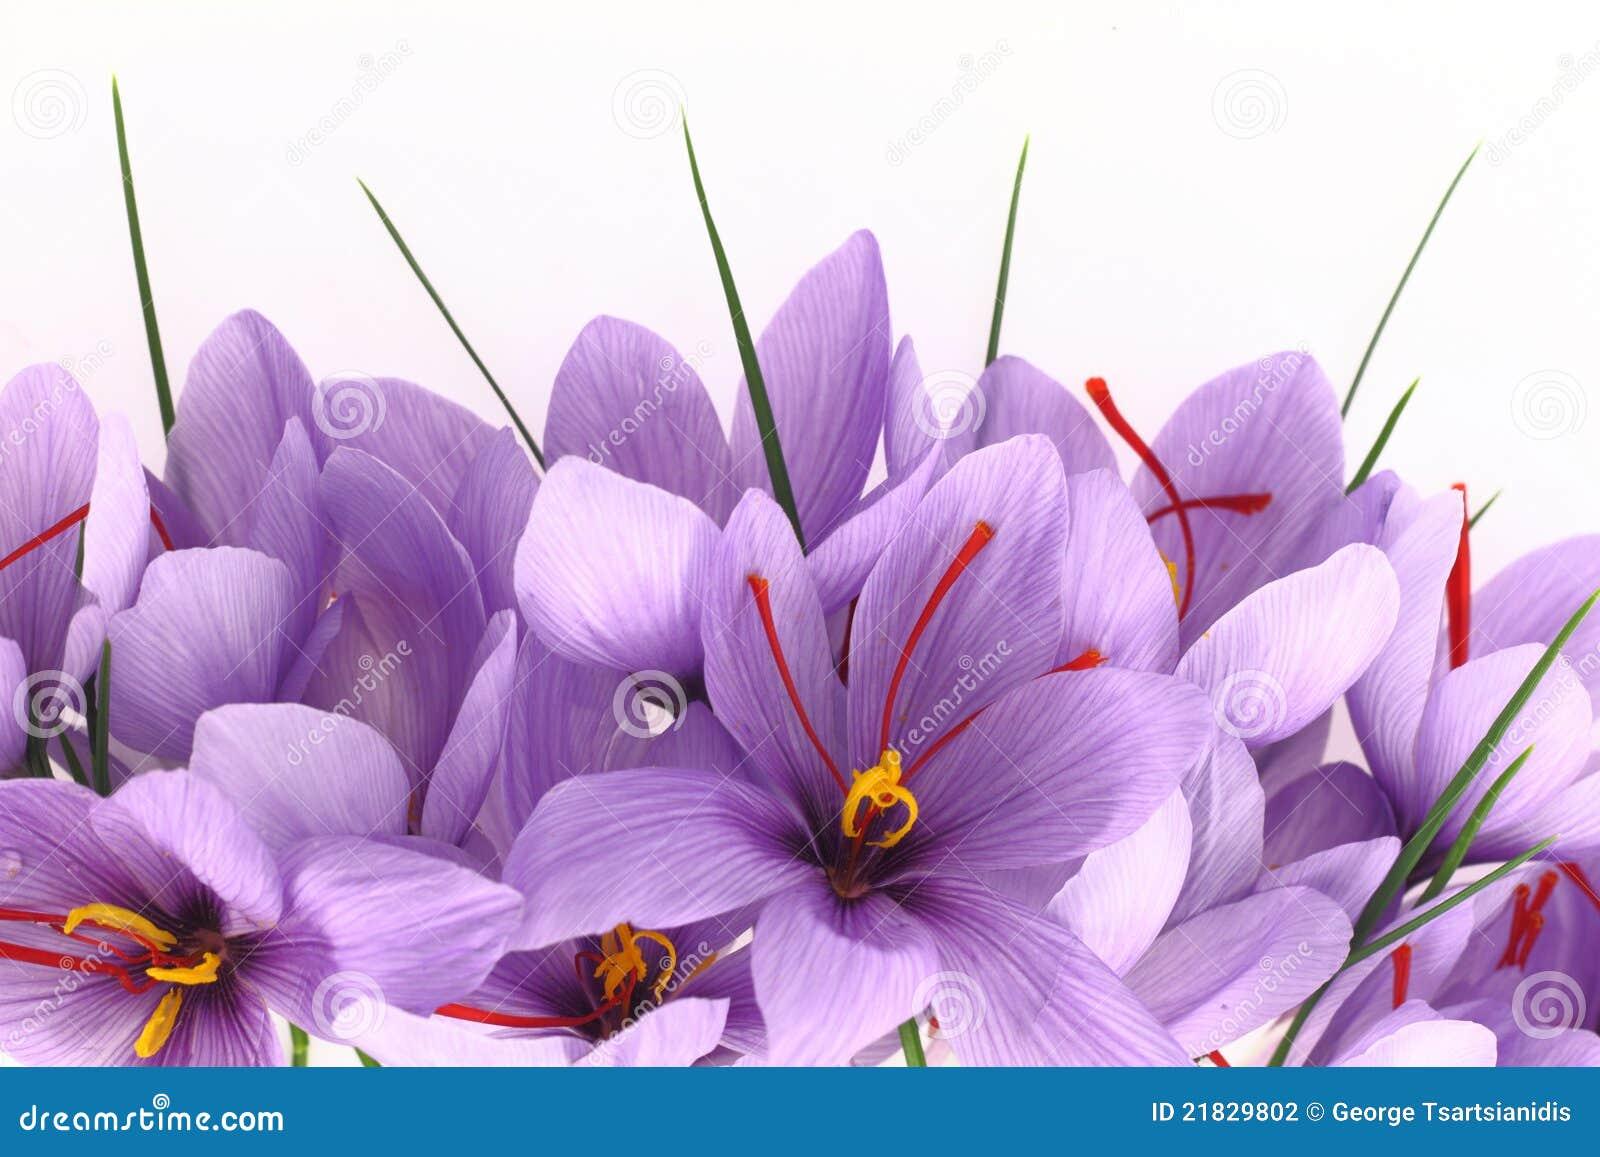 Saffron Flowers Stock graphy Image